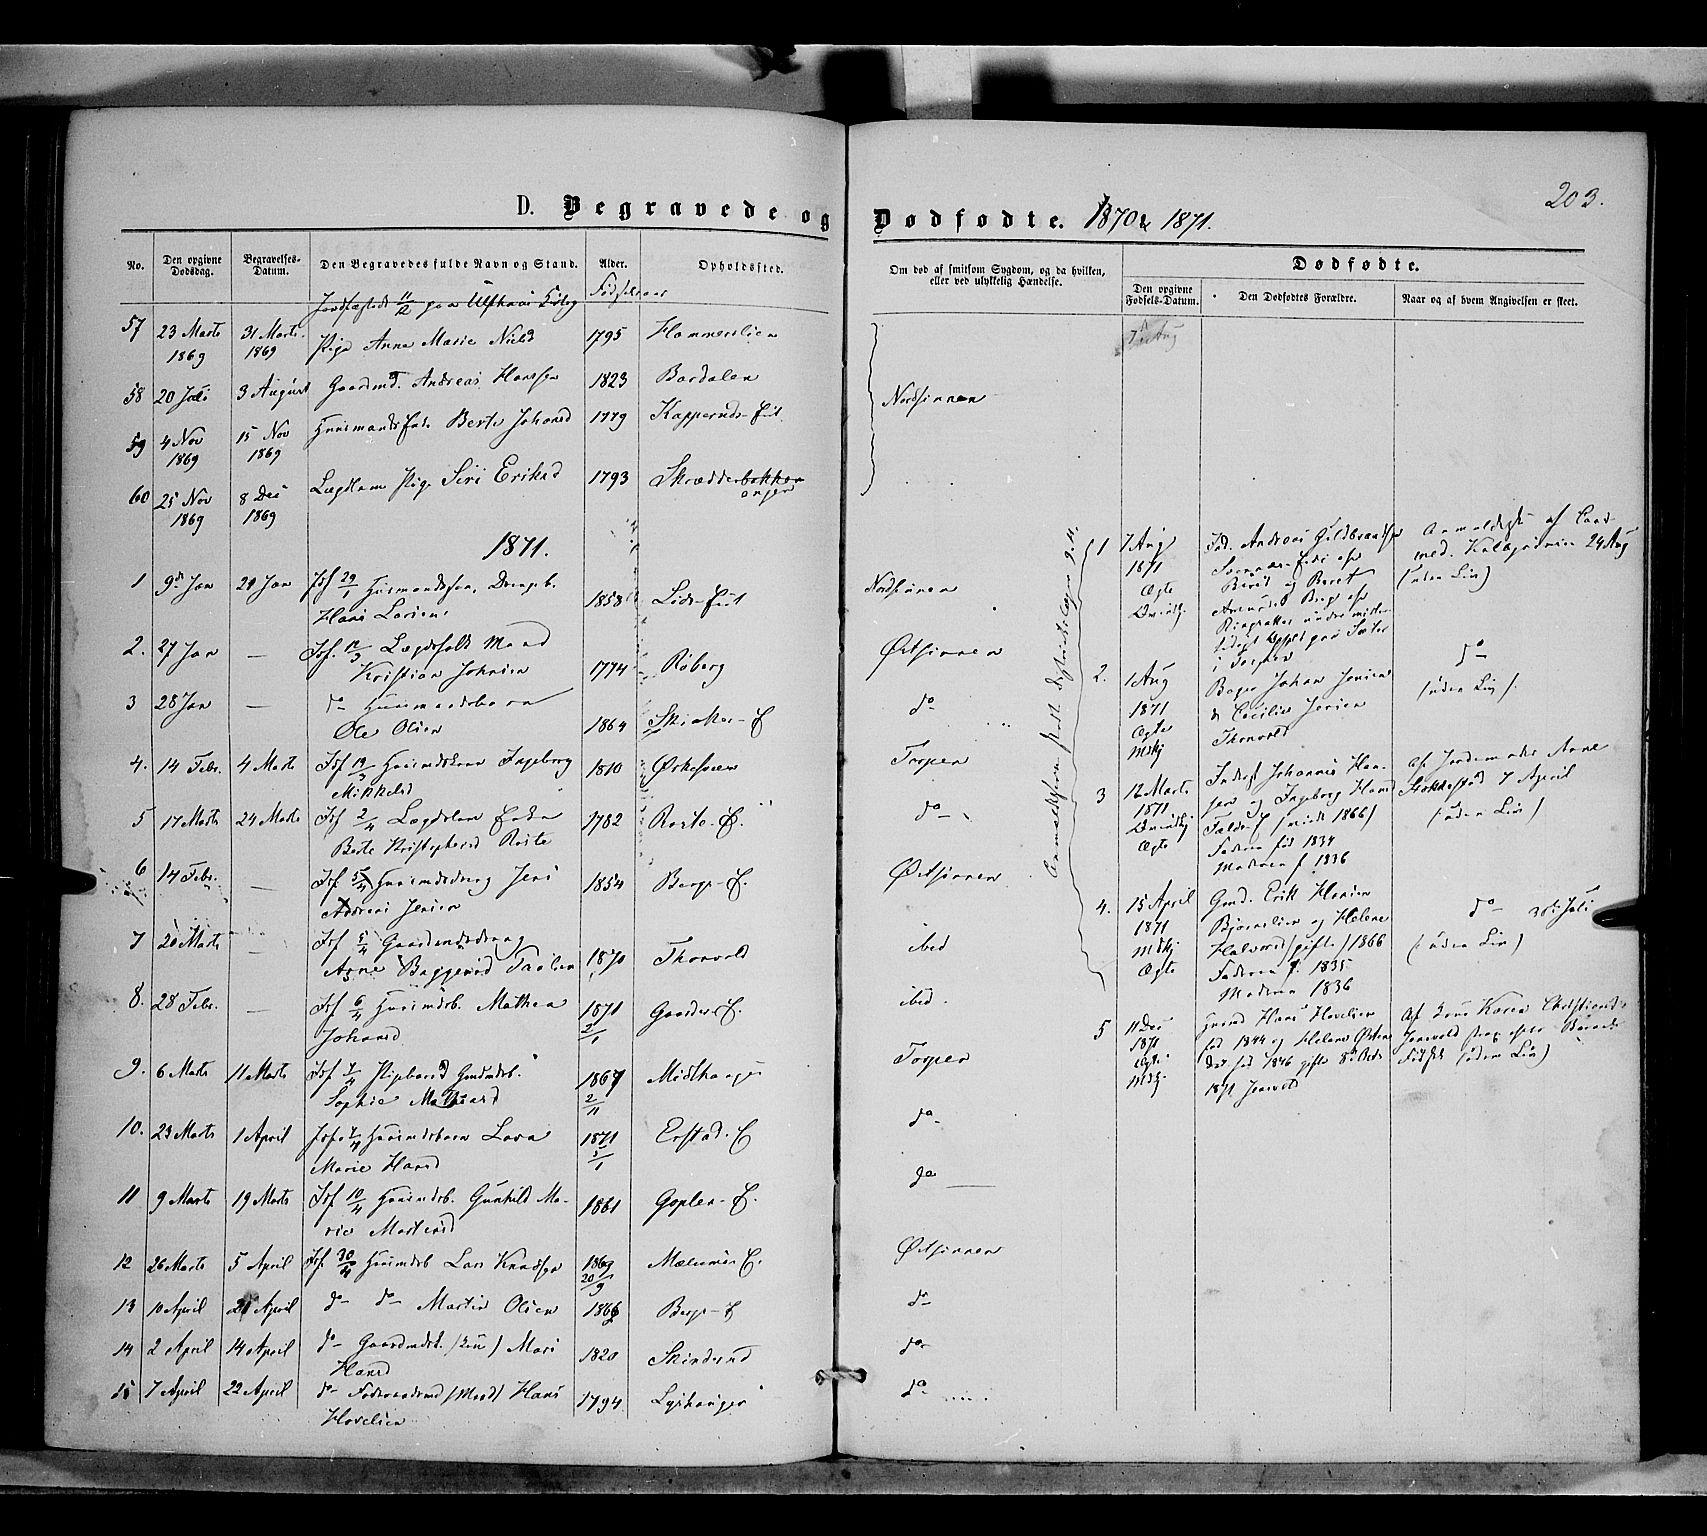 SAH, Nordre Land prestekontor, Ministerialbok nr. 1, 1860-1871, s. 203